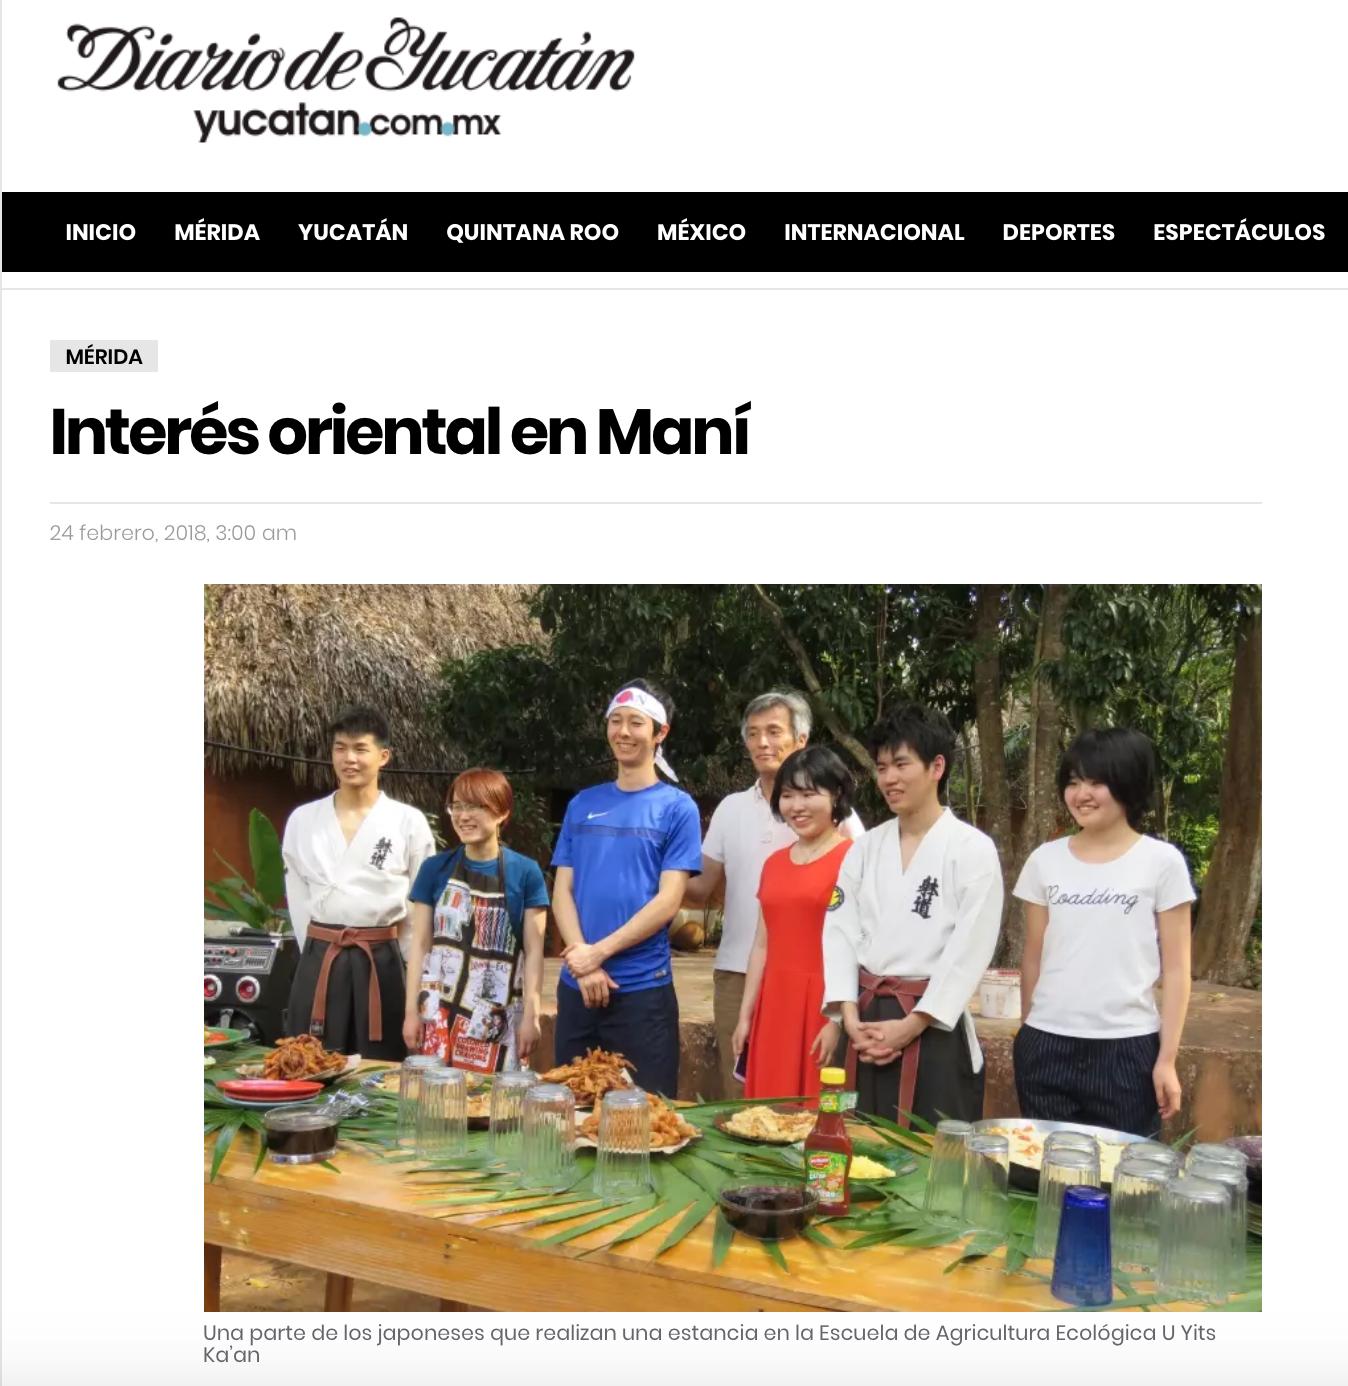 http://www.yucatan.com.mx/merida/interes-oriental-en-mani